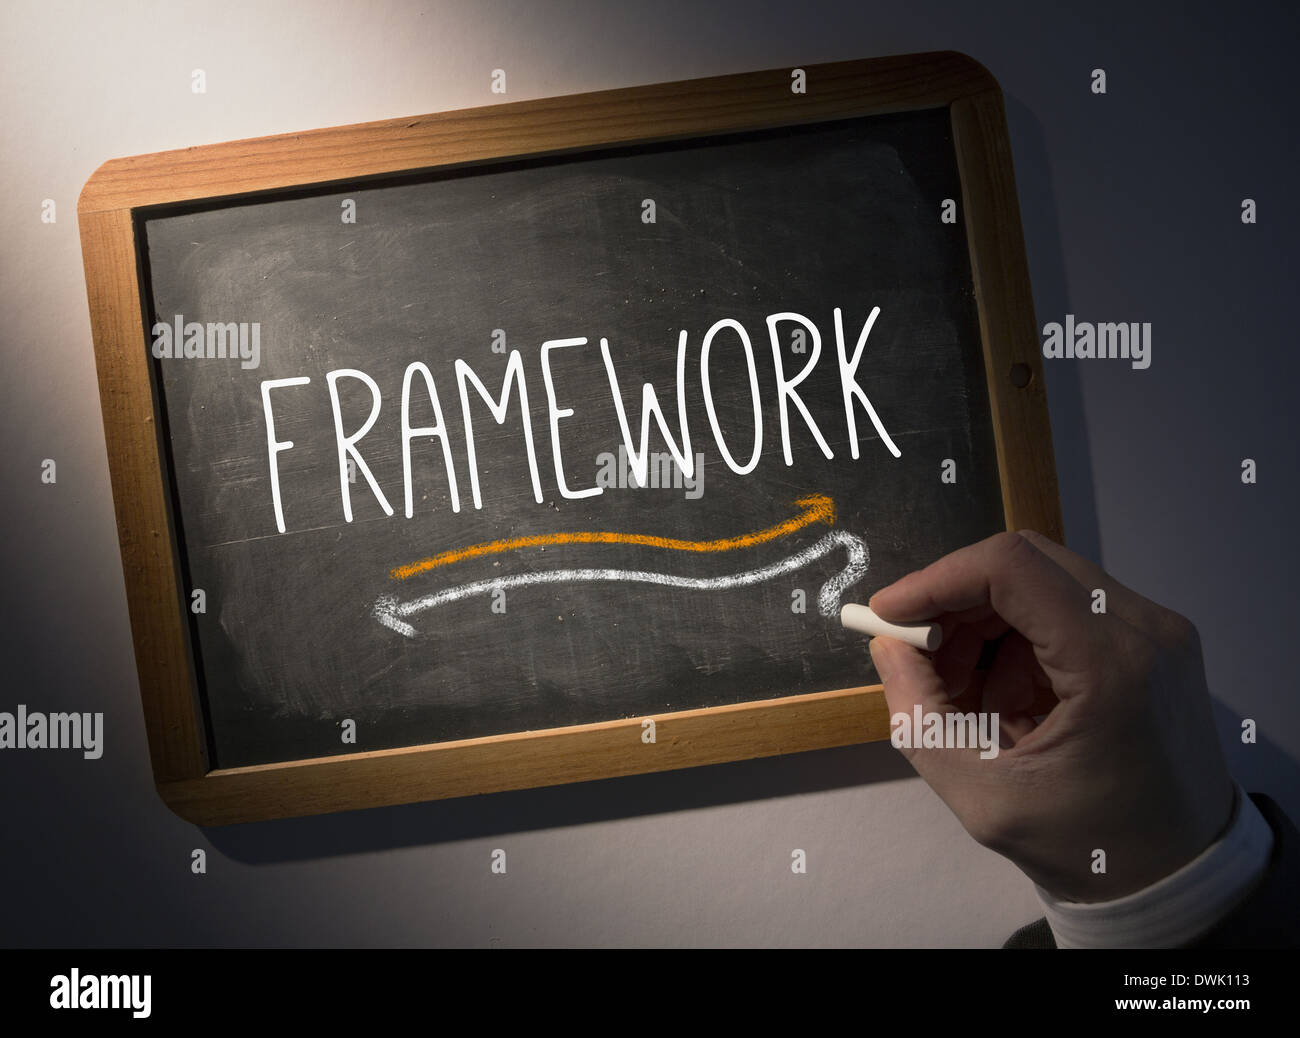 Framework For Text Stockfotos & Framework For Text Bilder - Alamy